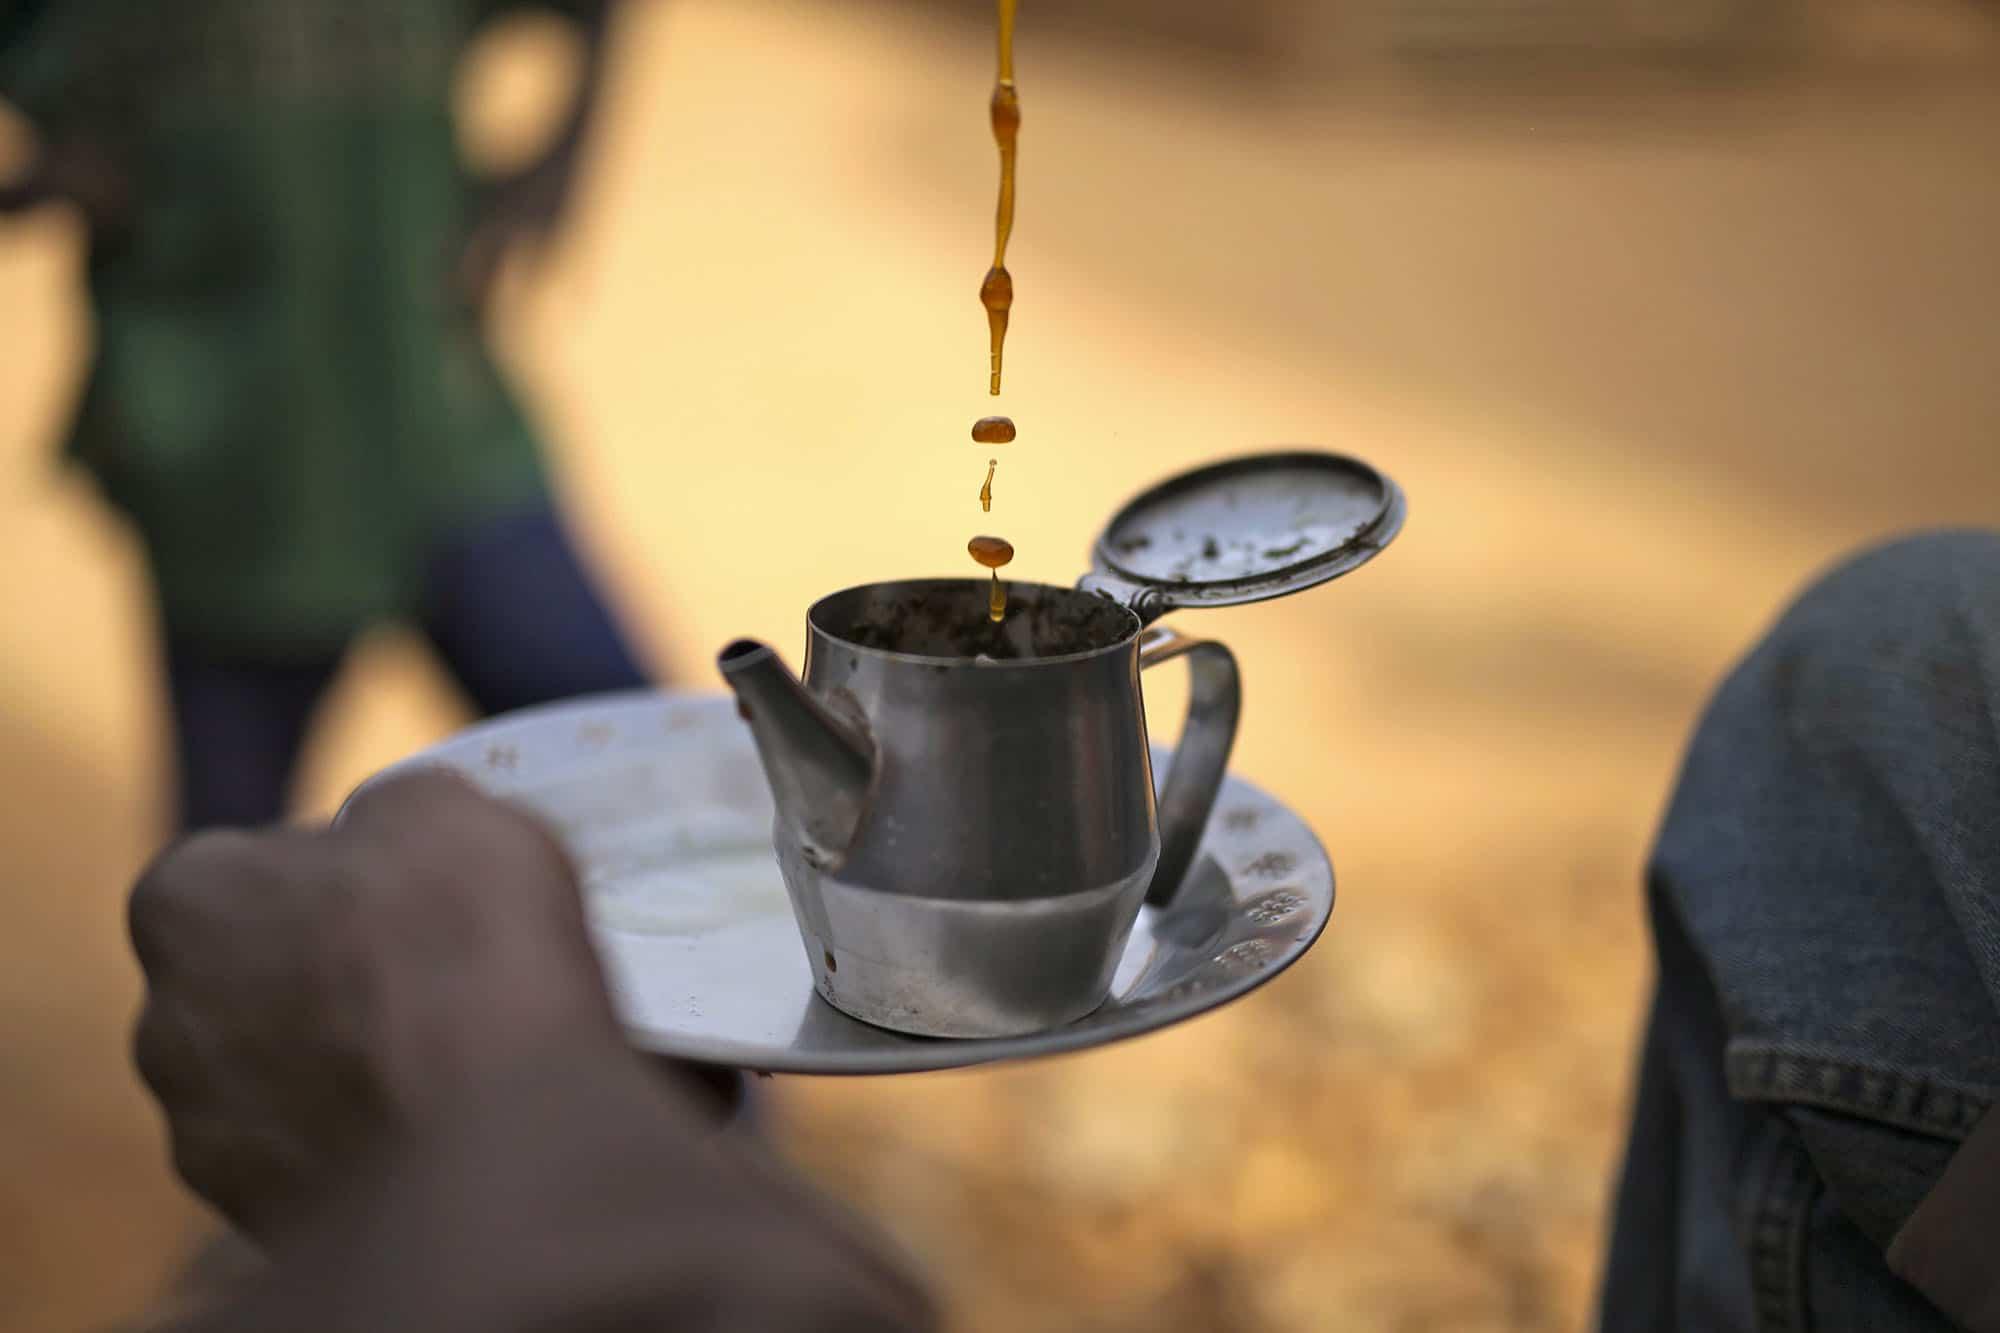 Un thé ? Crédit photo : Czar, Kad Services, Burkina Faso, 2015